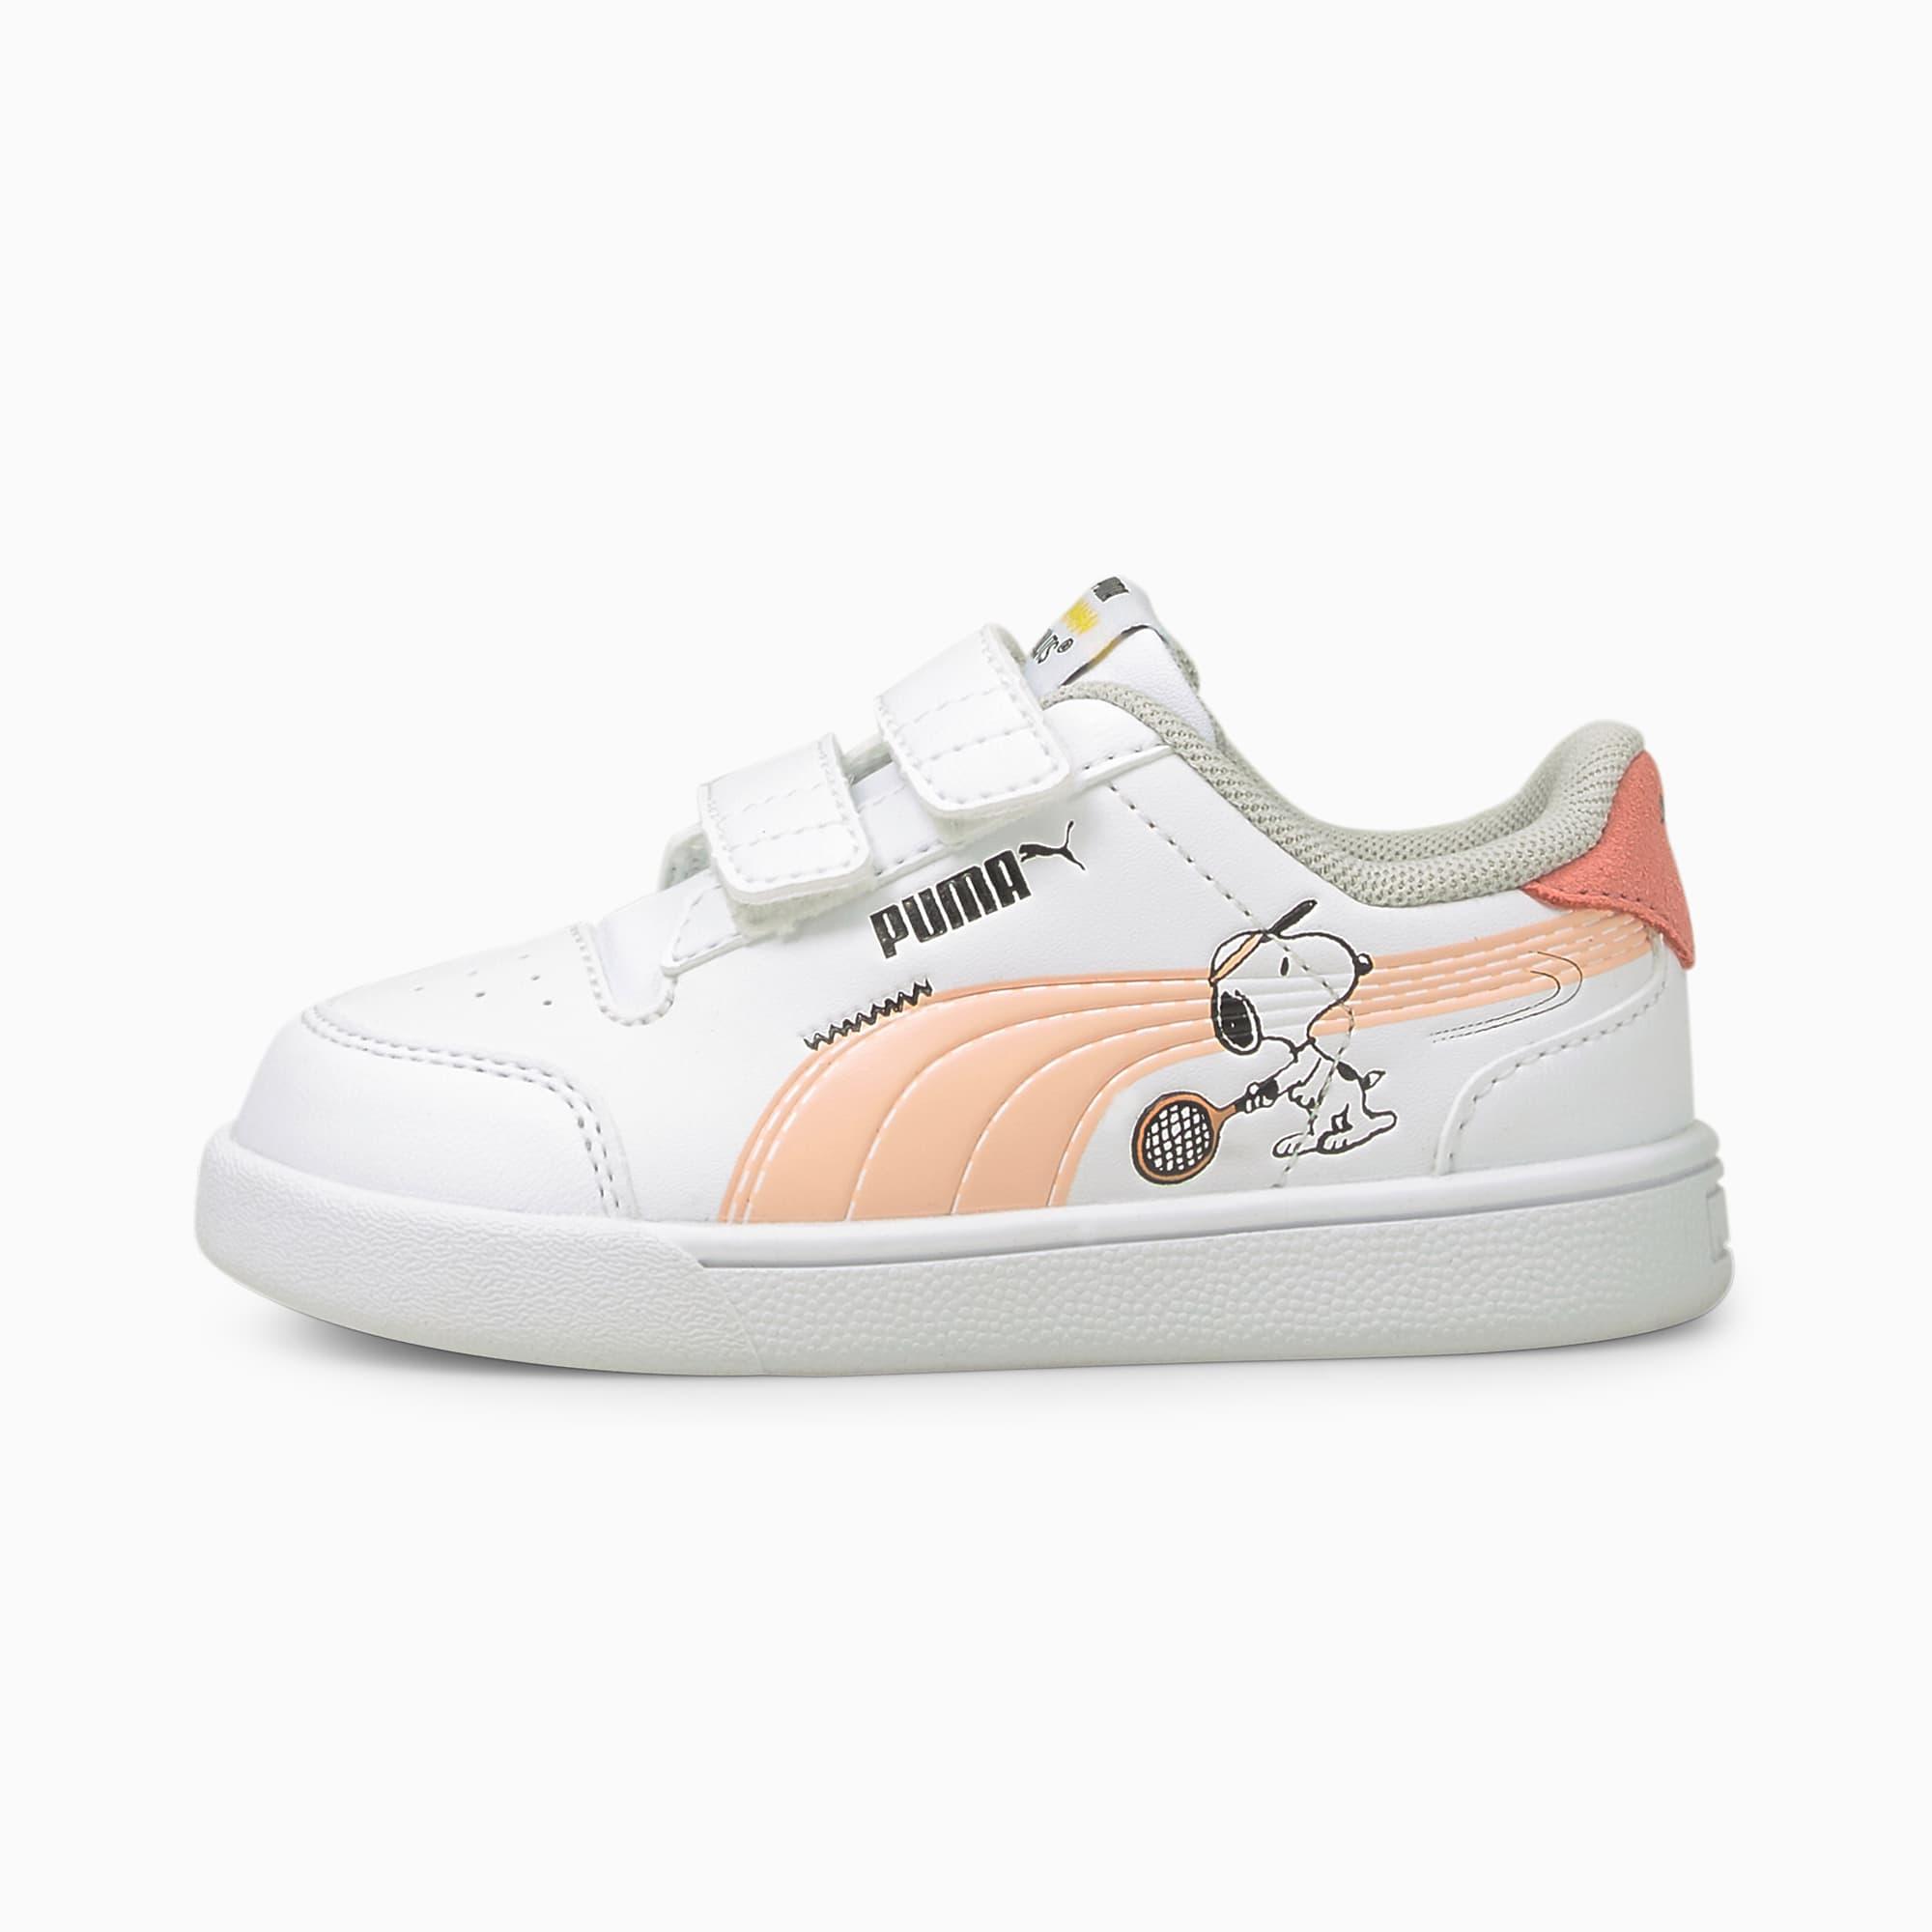 PUMA x PEANUTS Shuffle Toddler Shoes